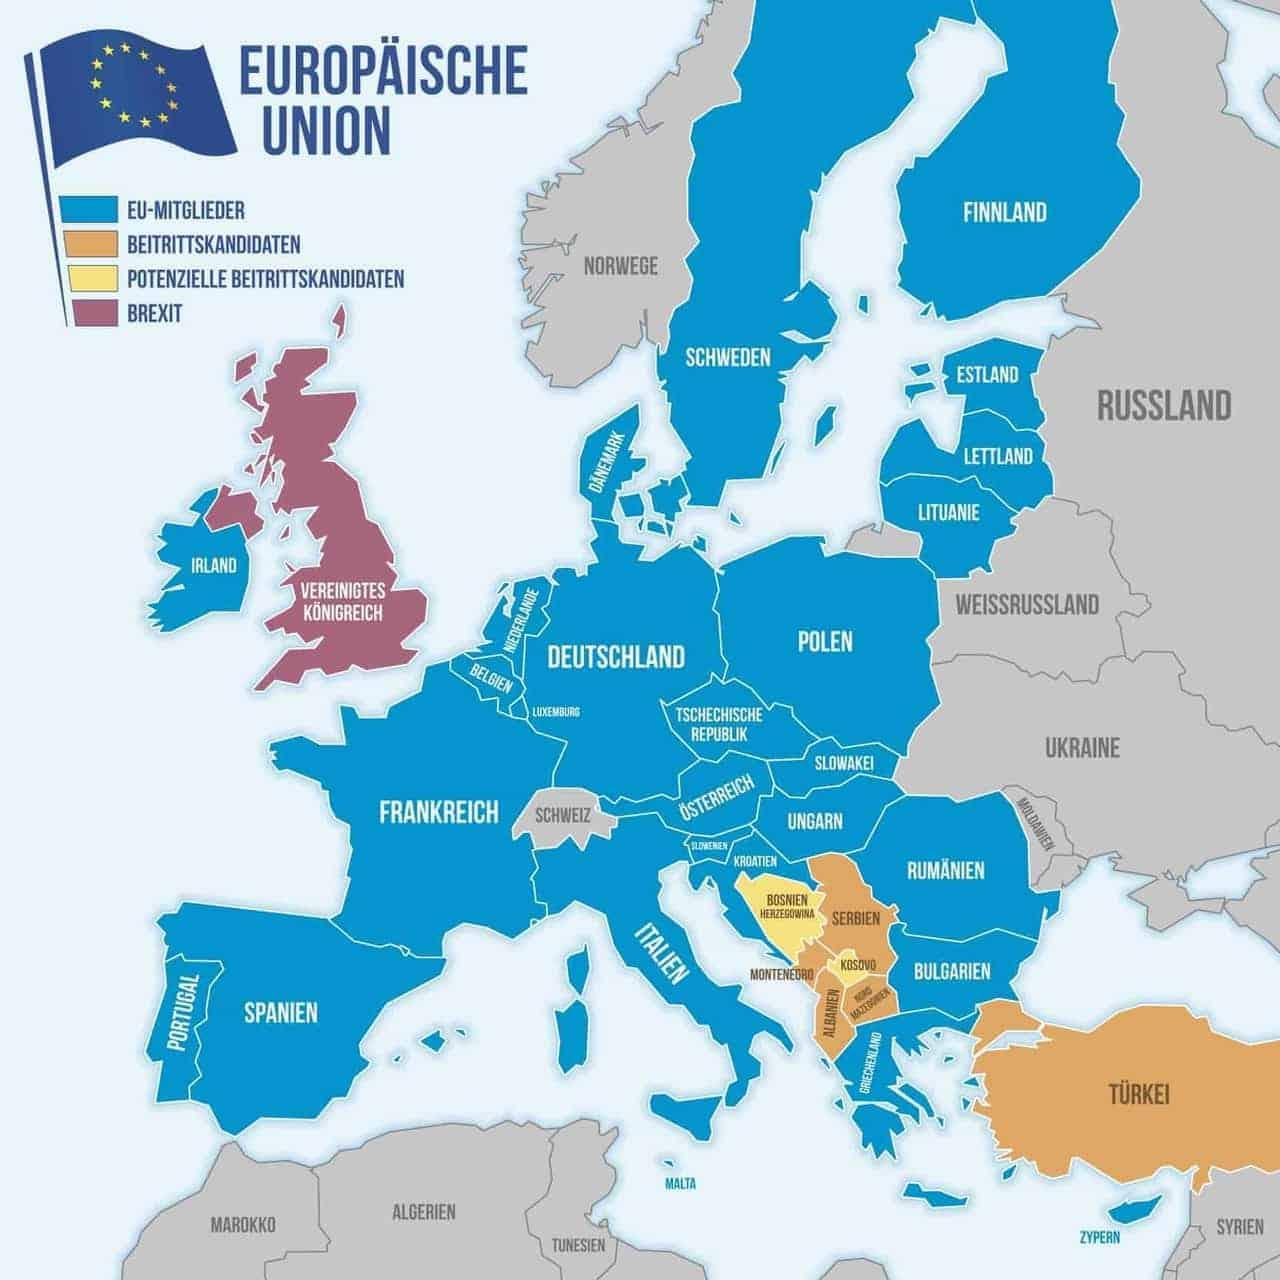 Europa_EU_Mitgliedsstatten